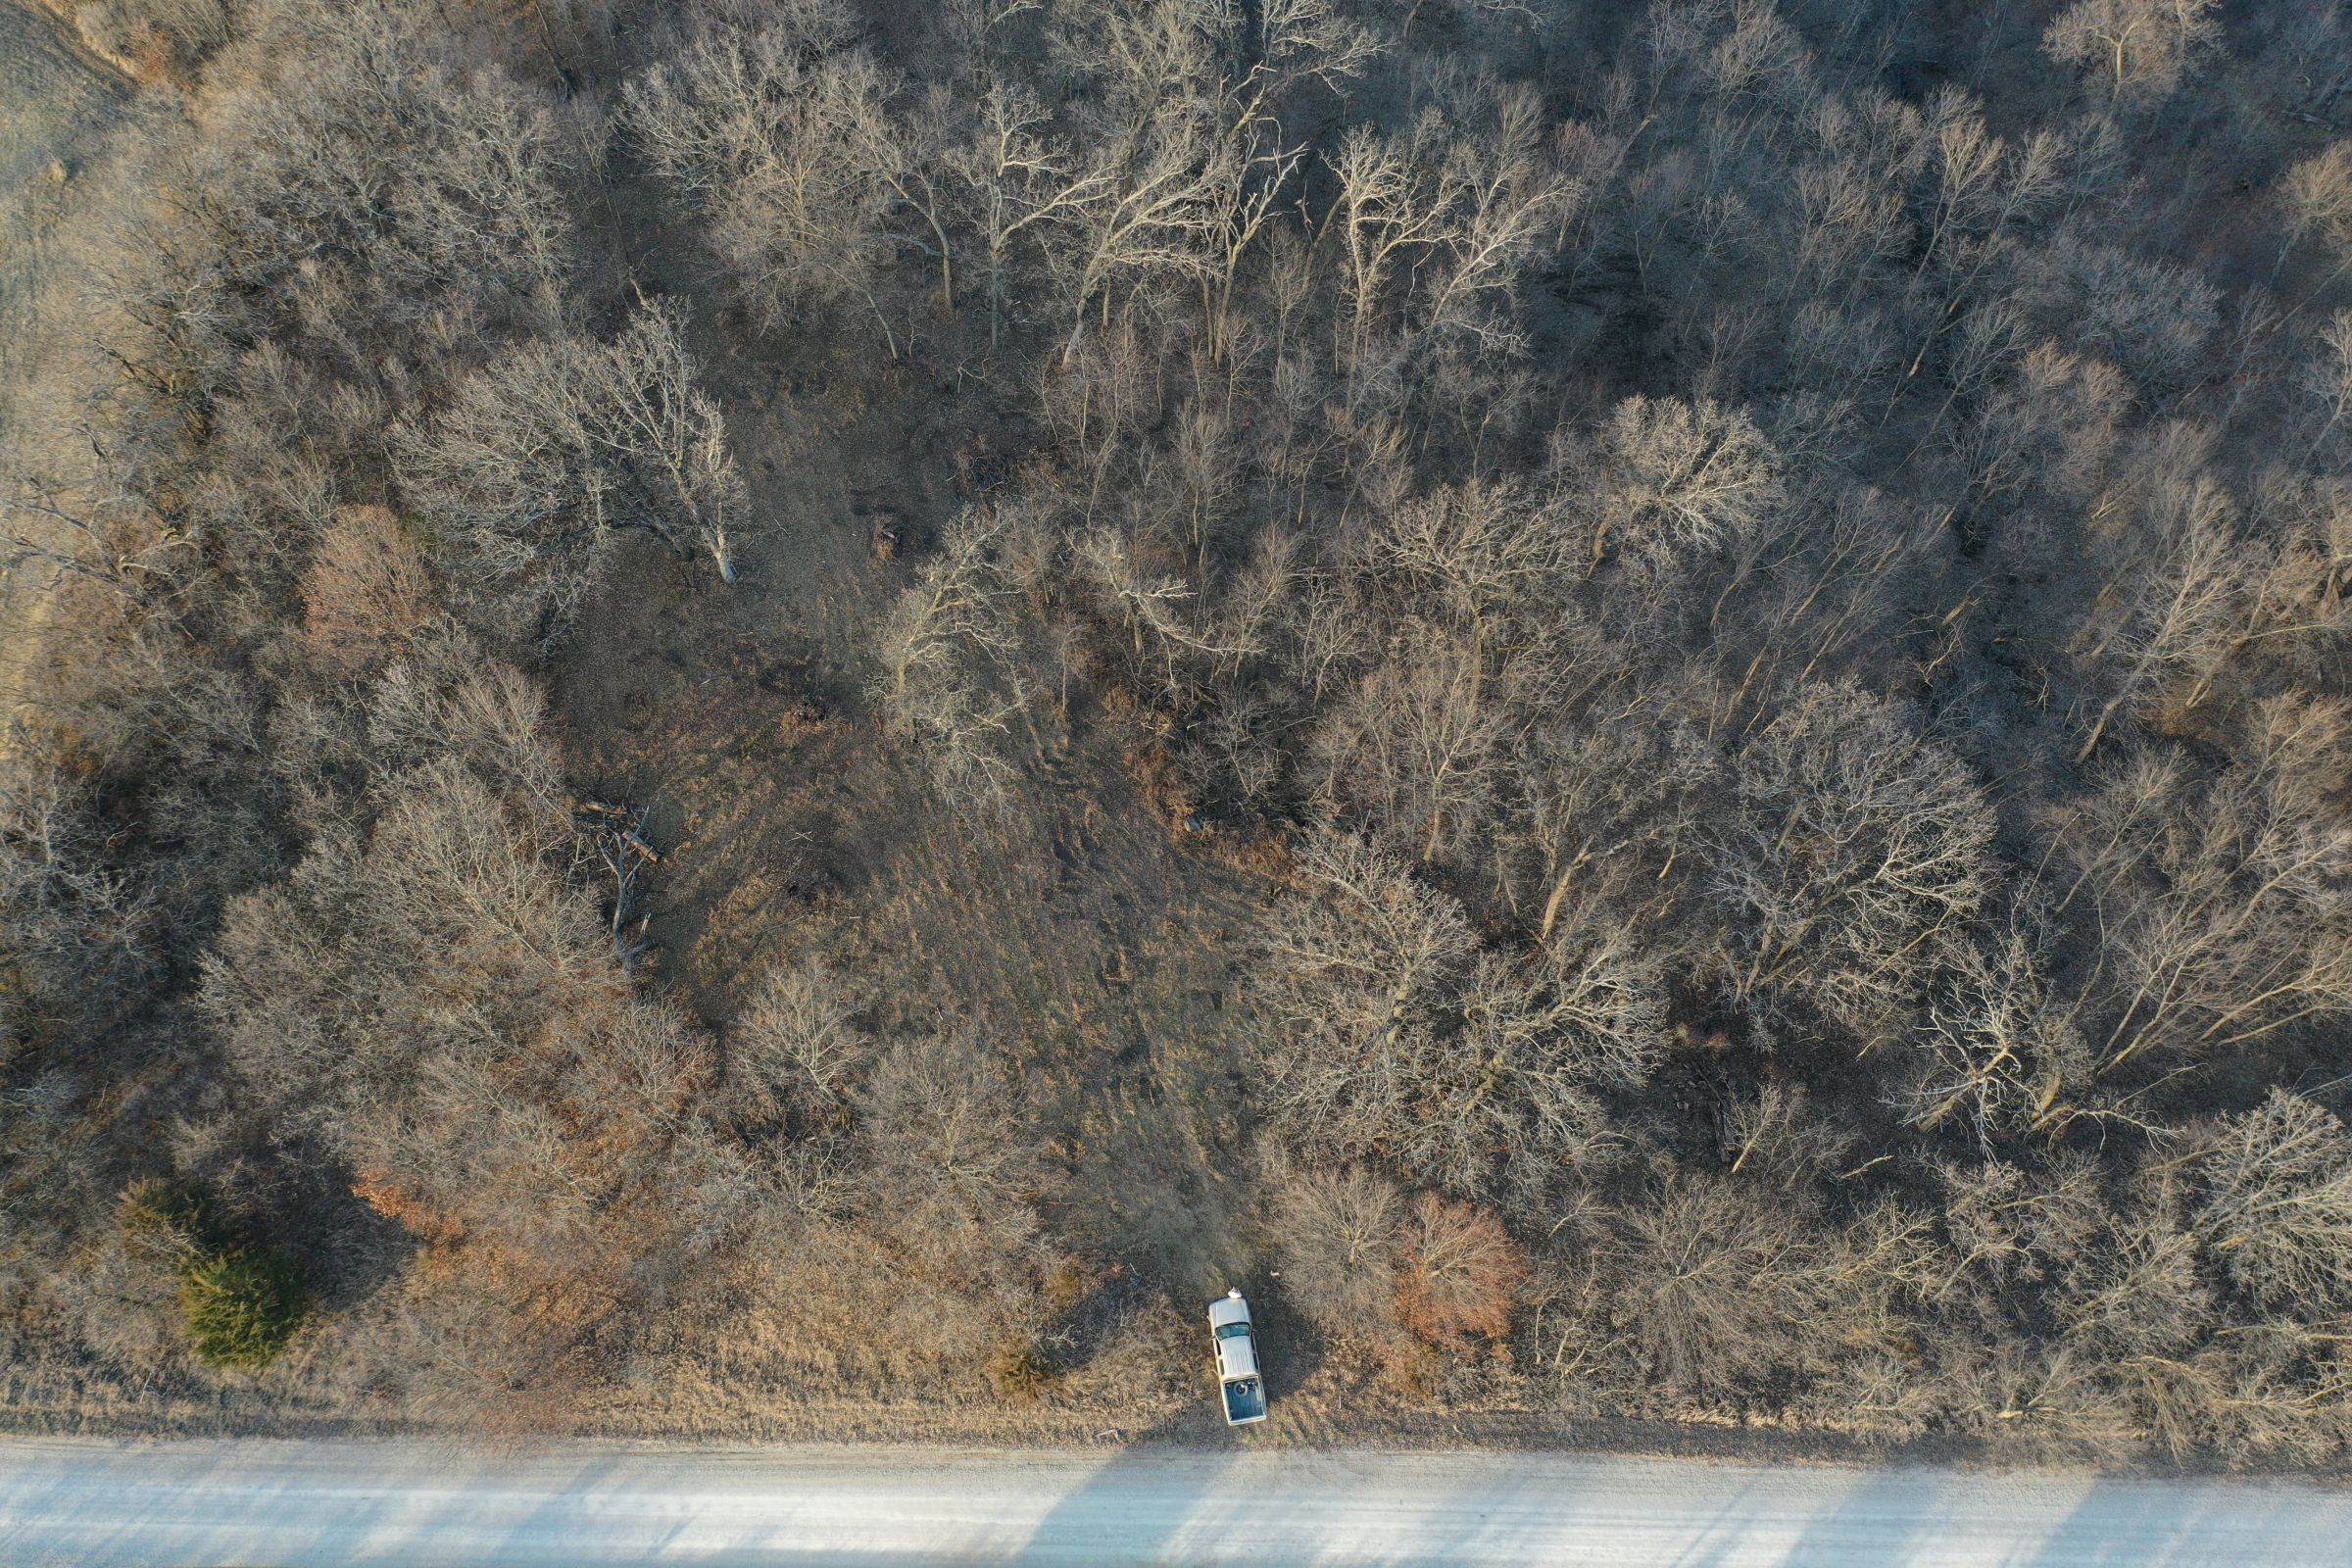 land-warren-county-iowa-10-acres-listing-number-15275-1-2020-12-11-165138.jpg